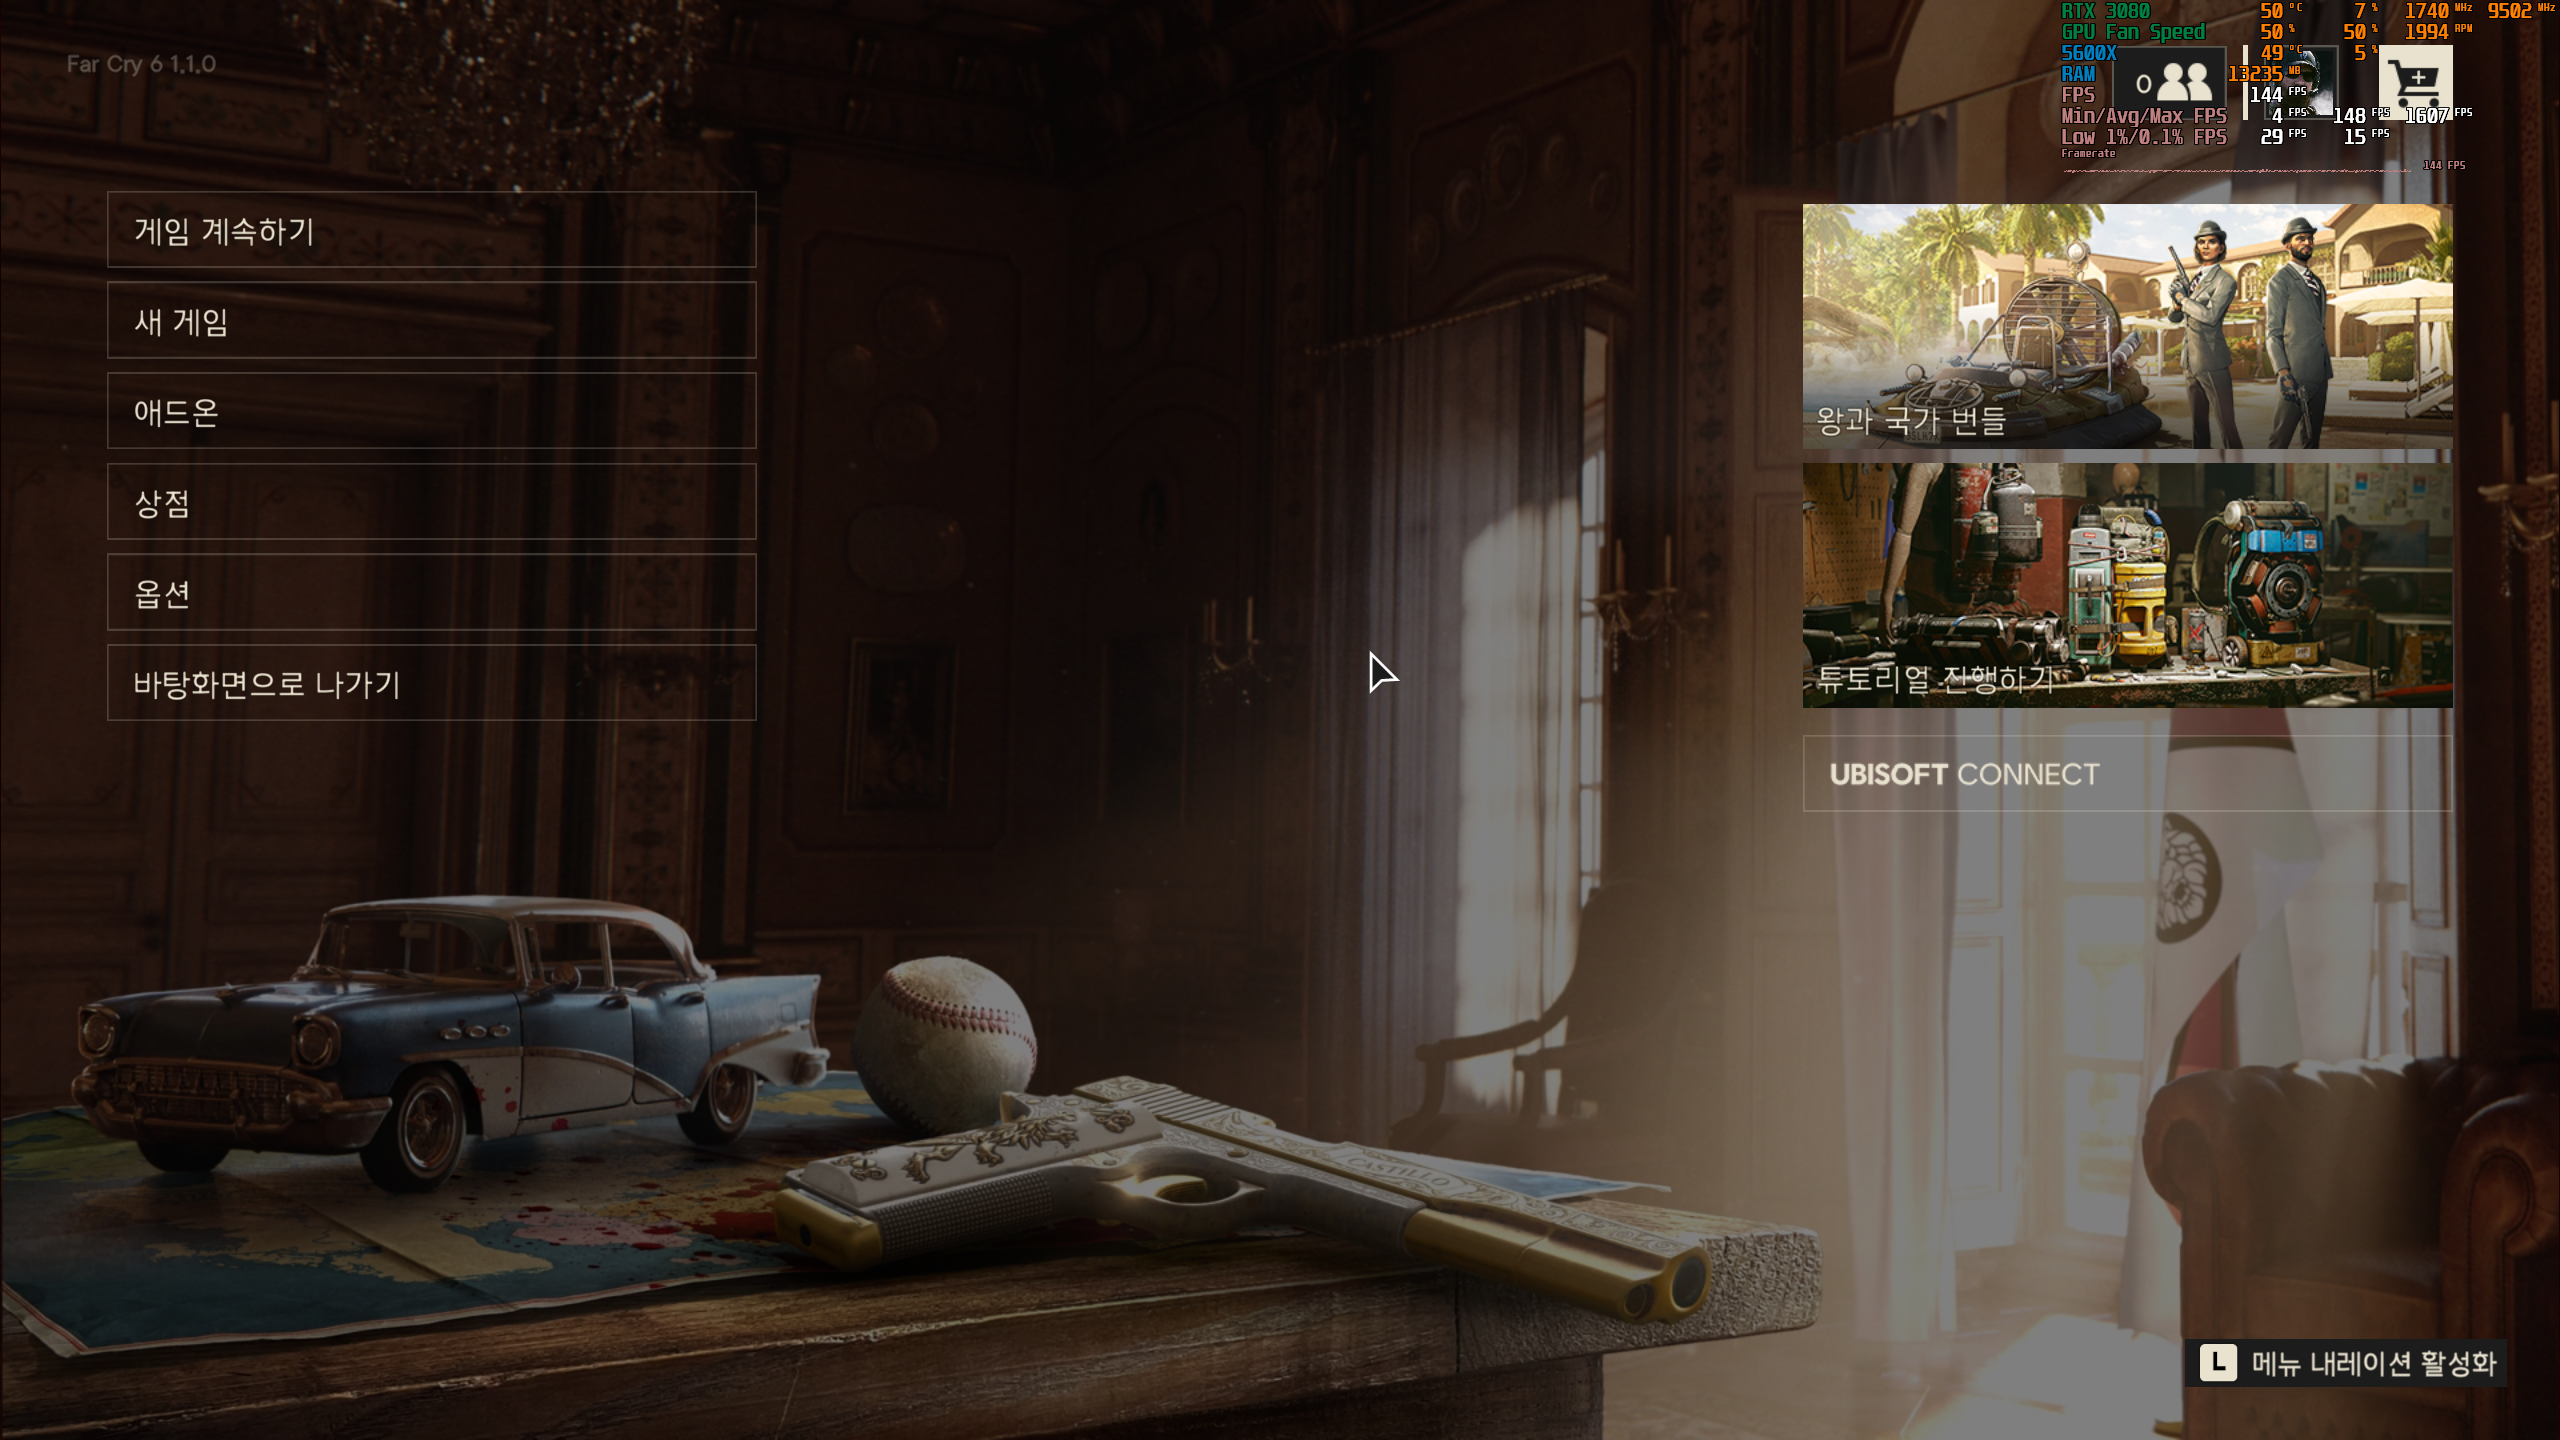 Far Cry 6 Screenshot 2021.10.11 - 03.20.14.64.png